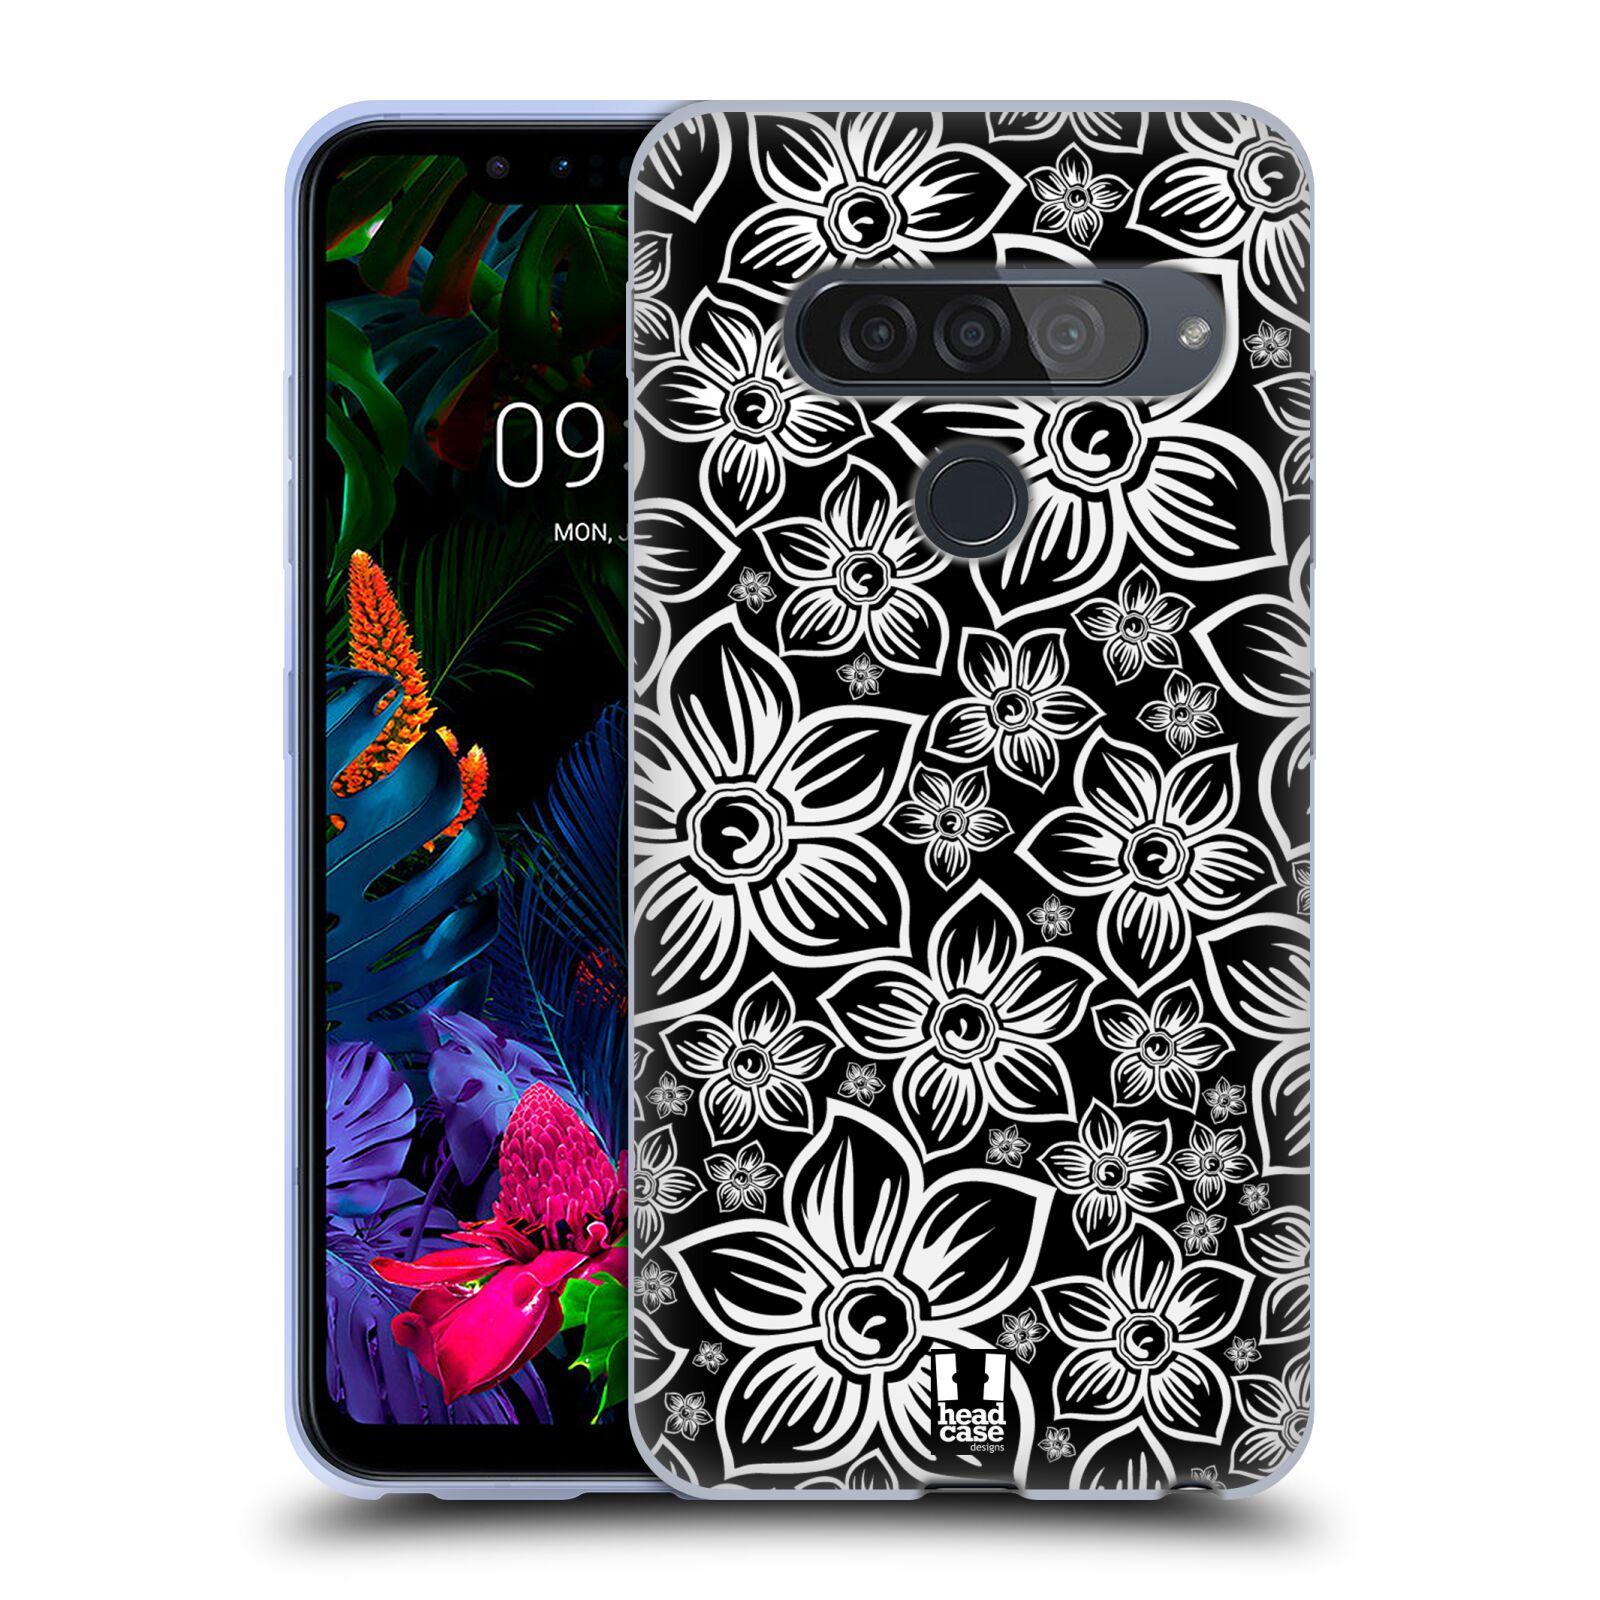 Silikonové pouzdro na mobil LG G8s ThinQ - Head Case - FLORAL DAISY